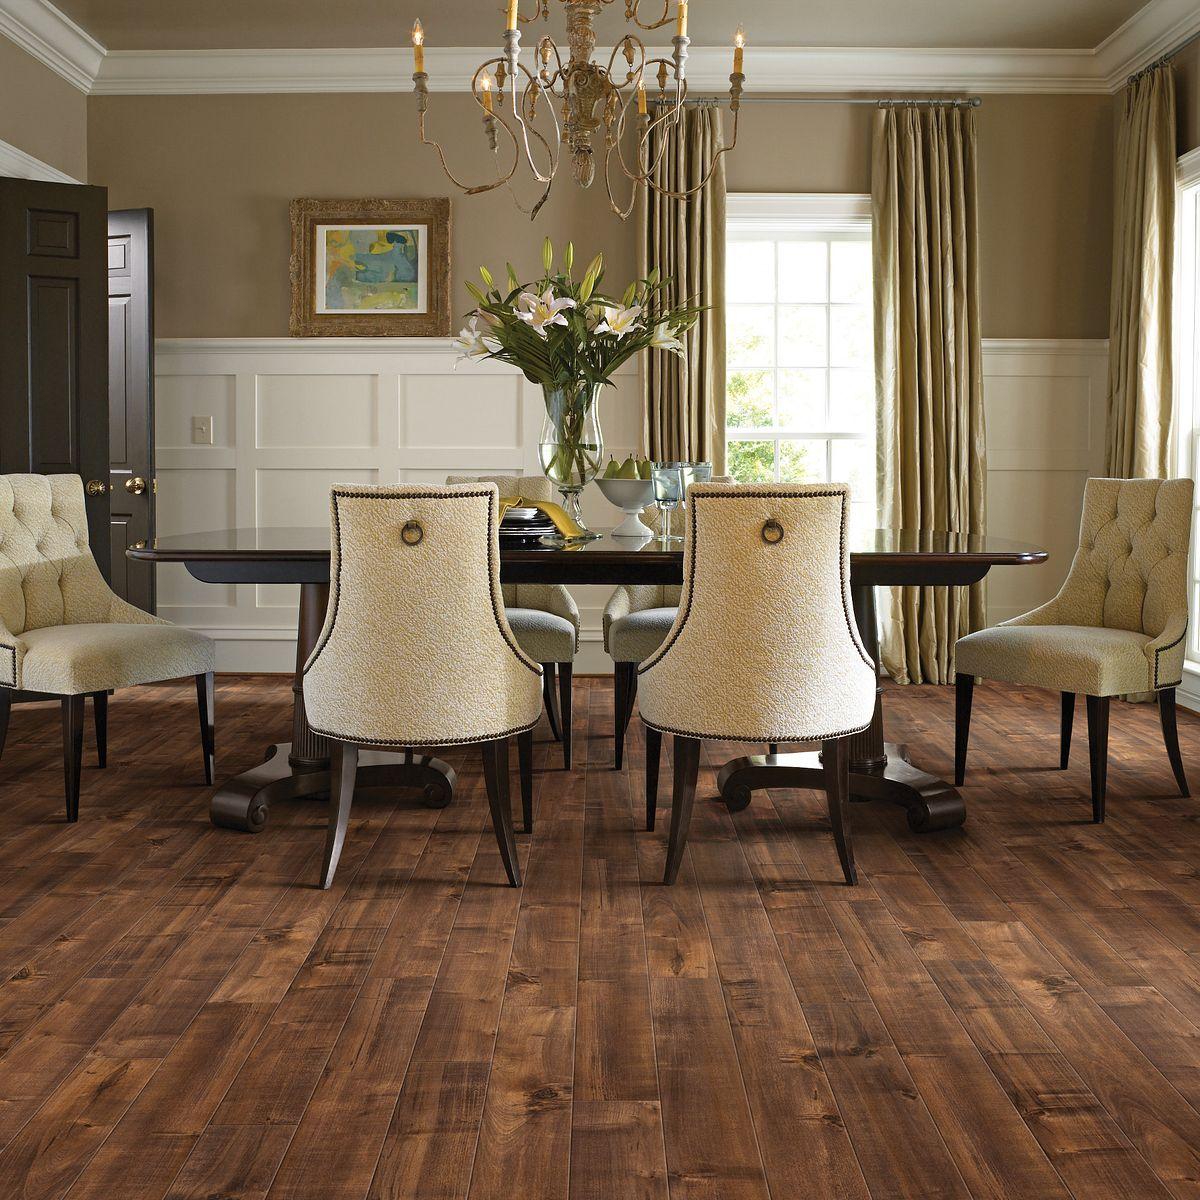 Laminate Flooring Shaw Floors, Discontinued Shaw Laminate Flooring